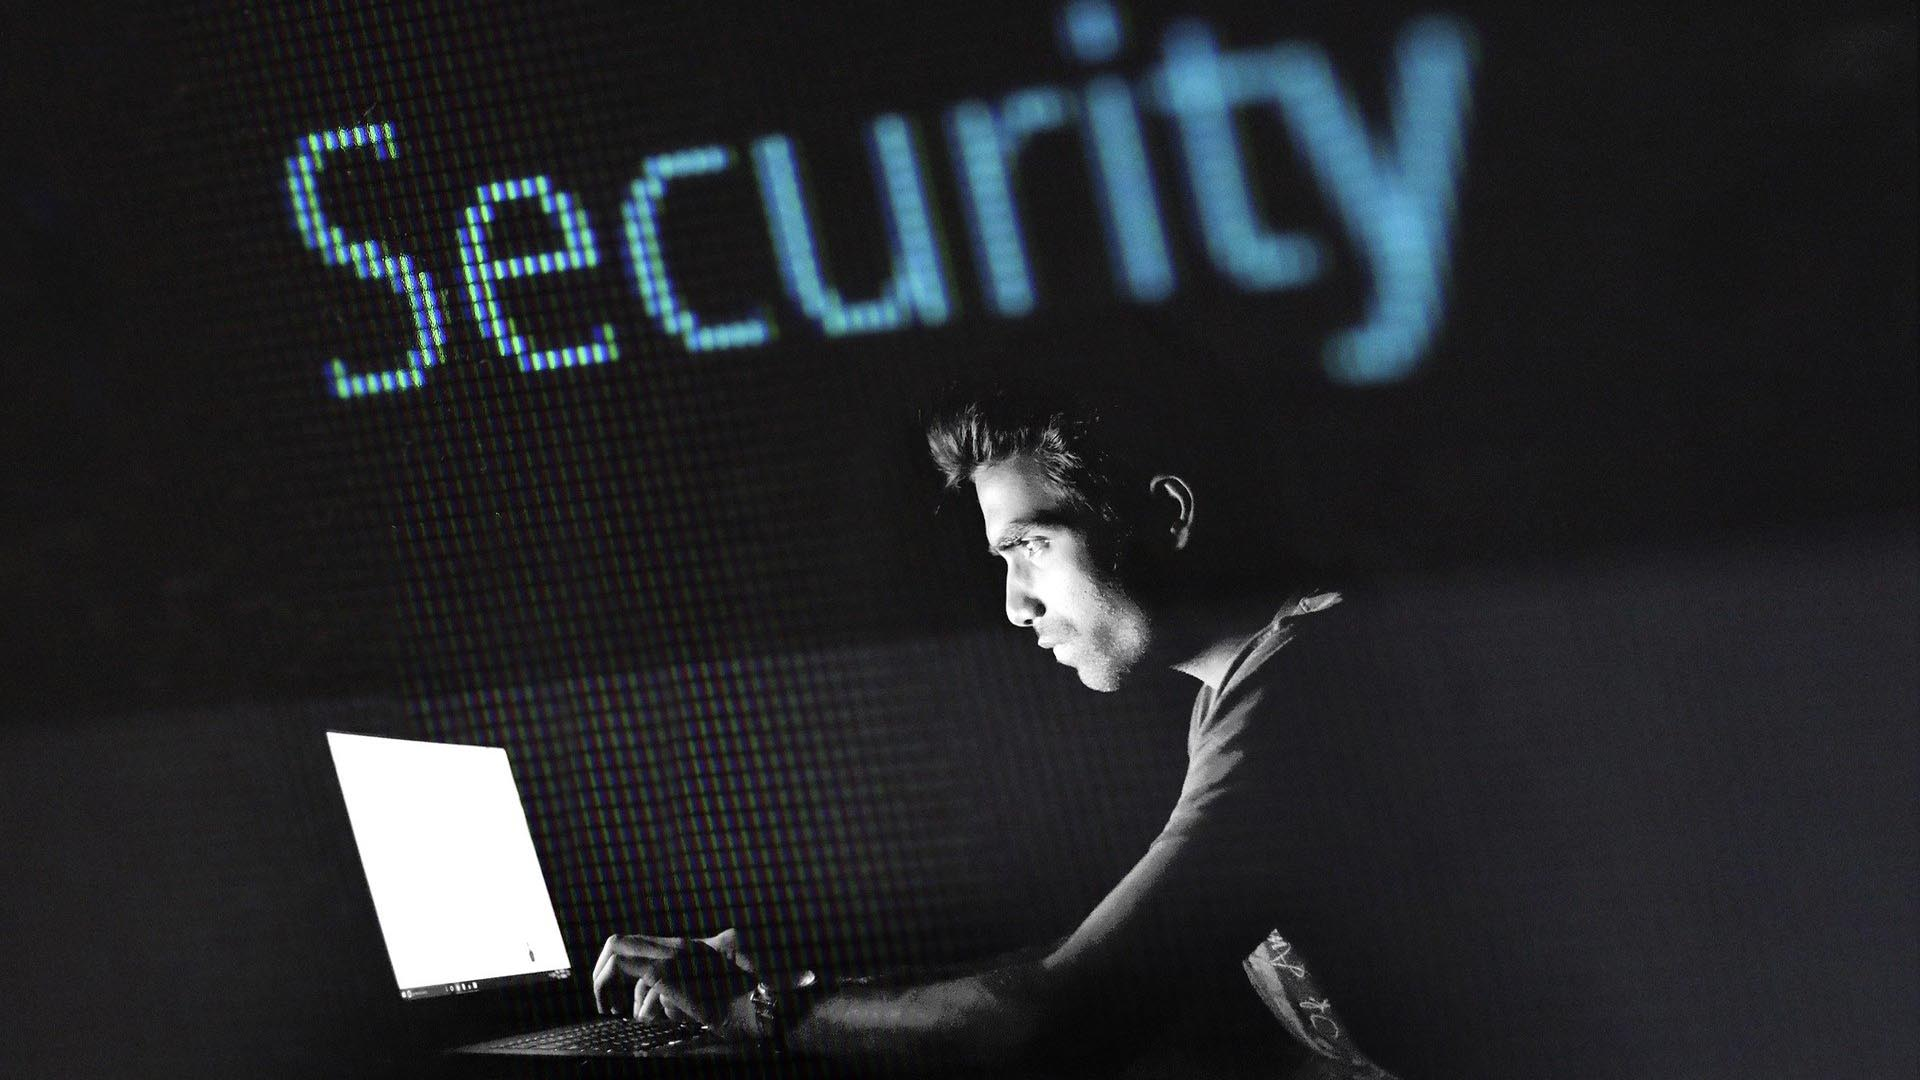 Sicurezza Informatica Dati virtuali guai reali